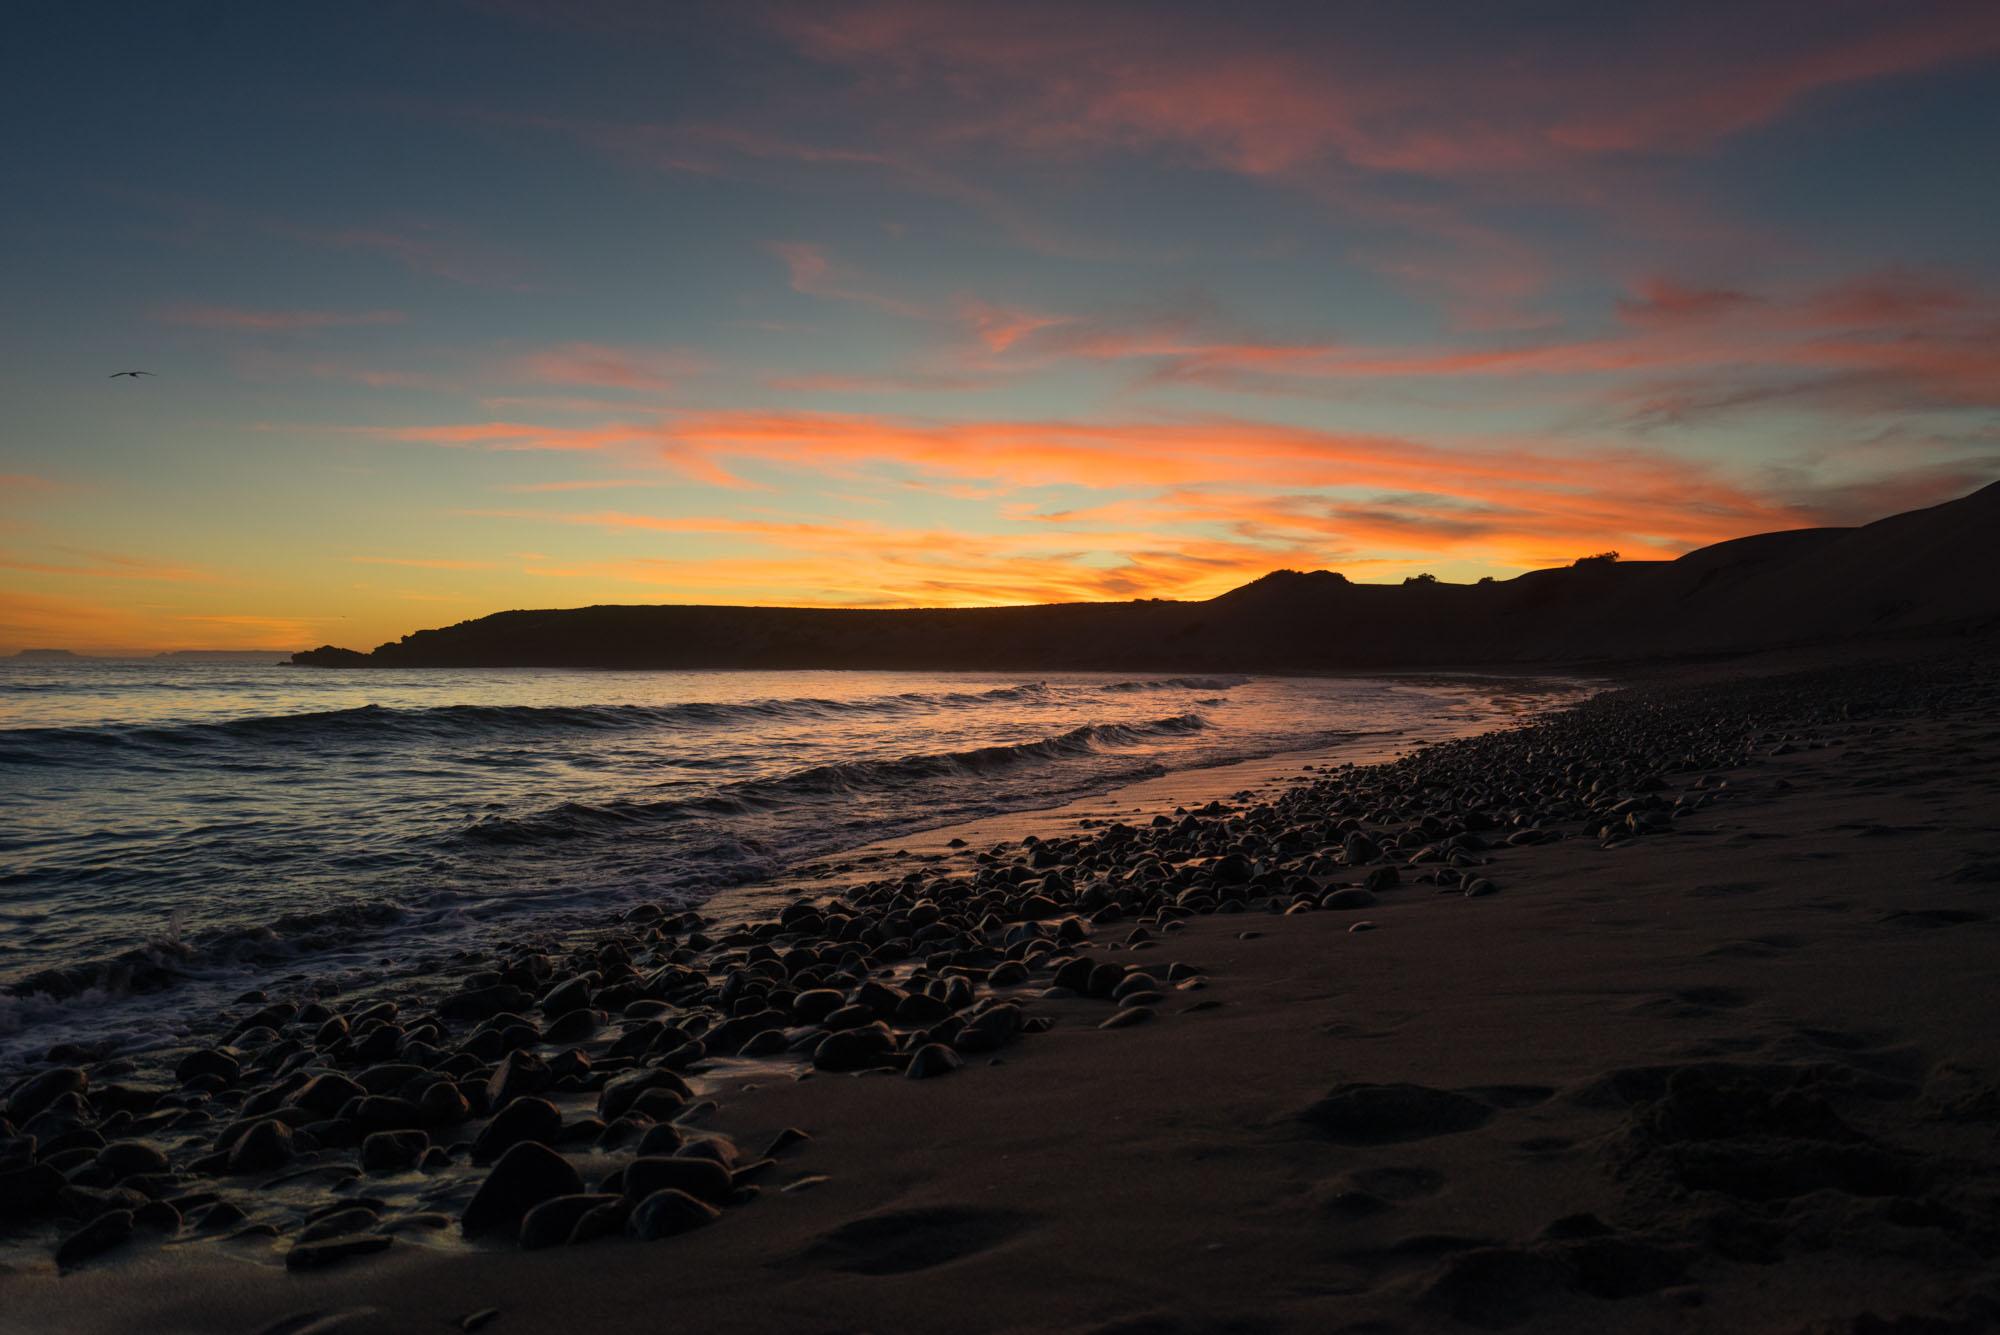 Sunset at El Cardon, One of the Seven Sisters, Baja California